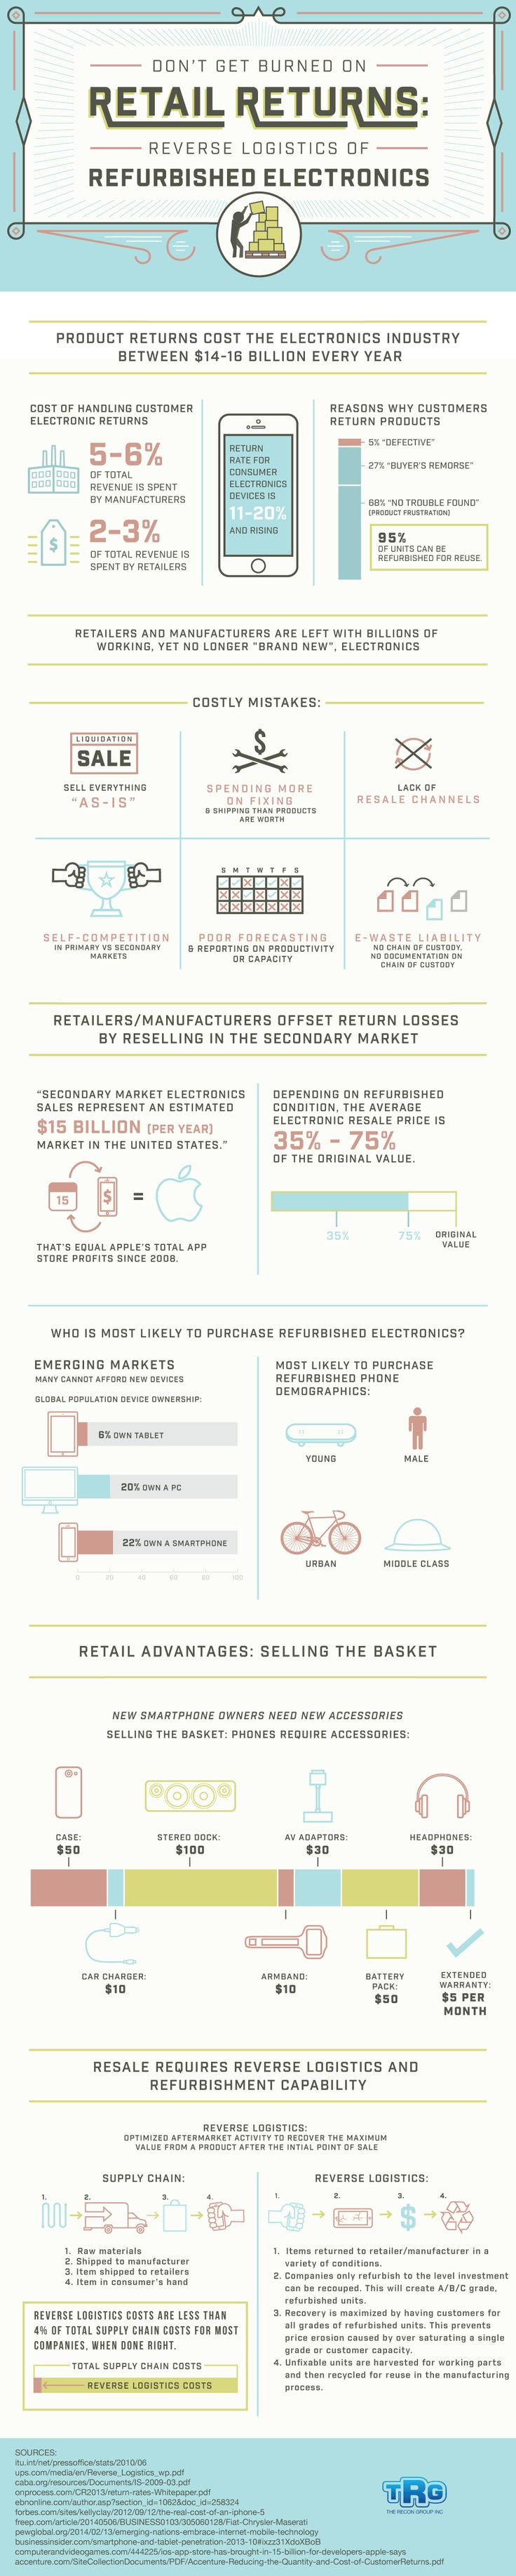 Reverse Logistics of Refurbished Electronics [Infographic]